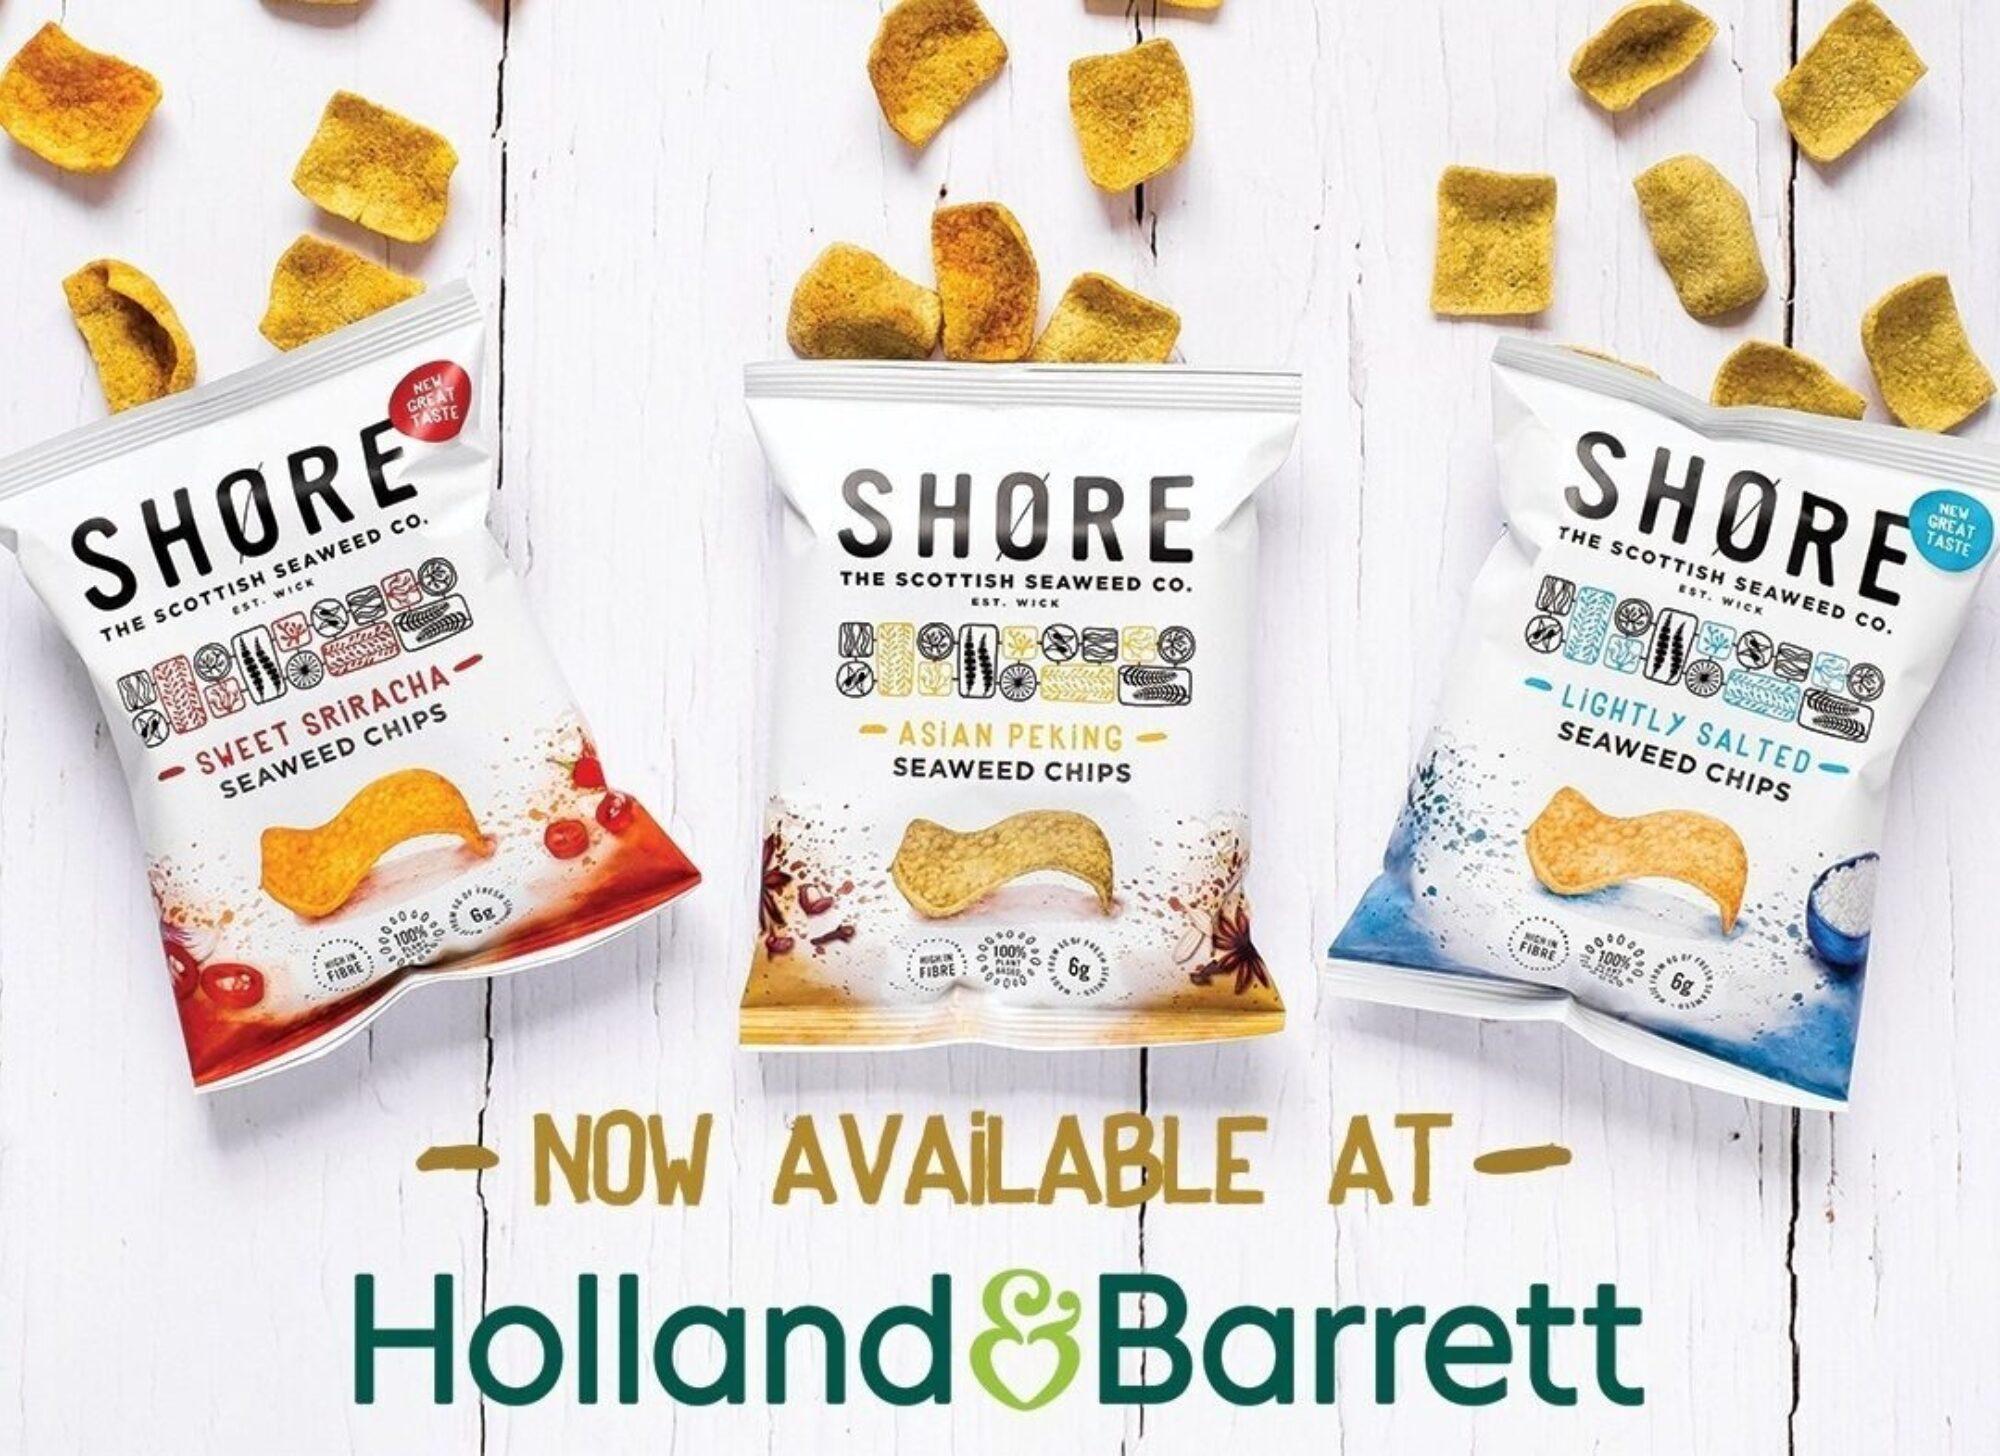 Shore_Seaweed_Holland_and_Barrett.jpg